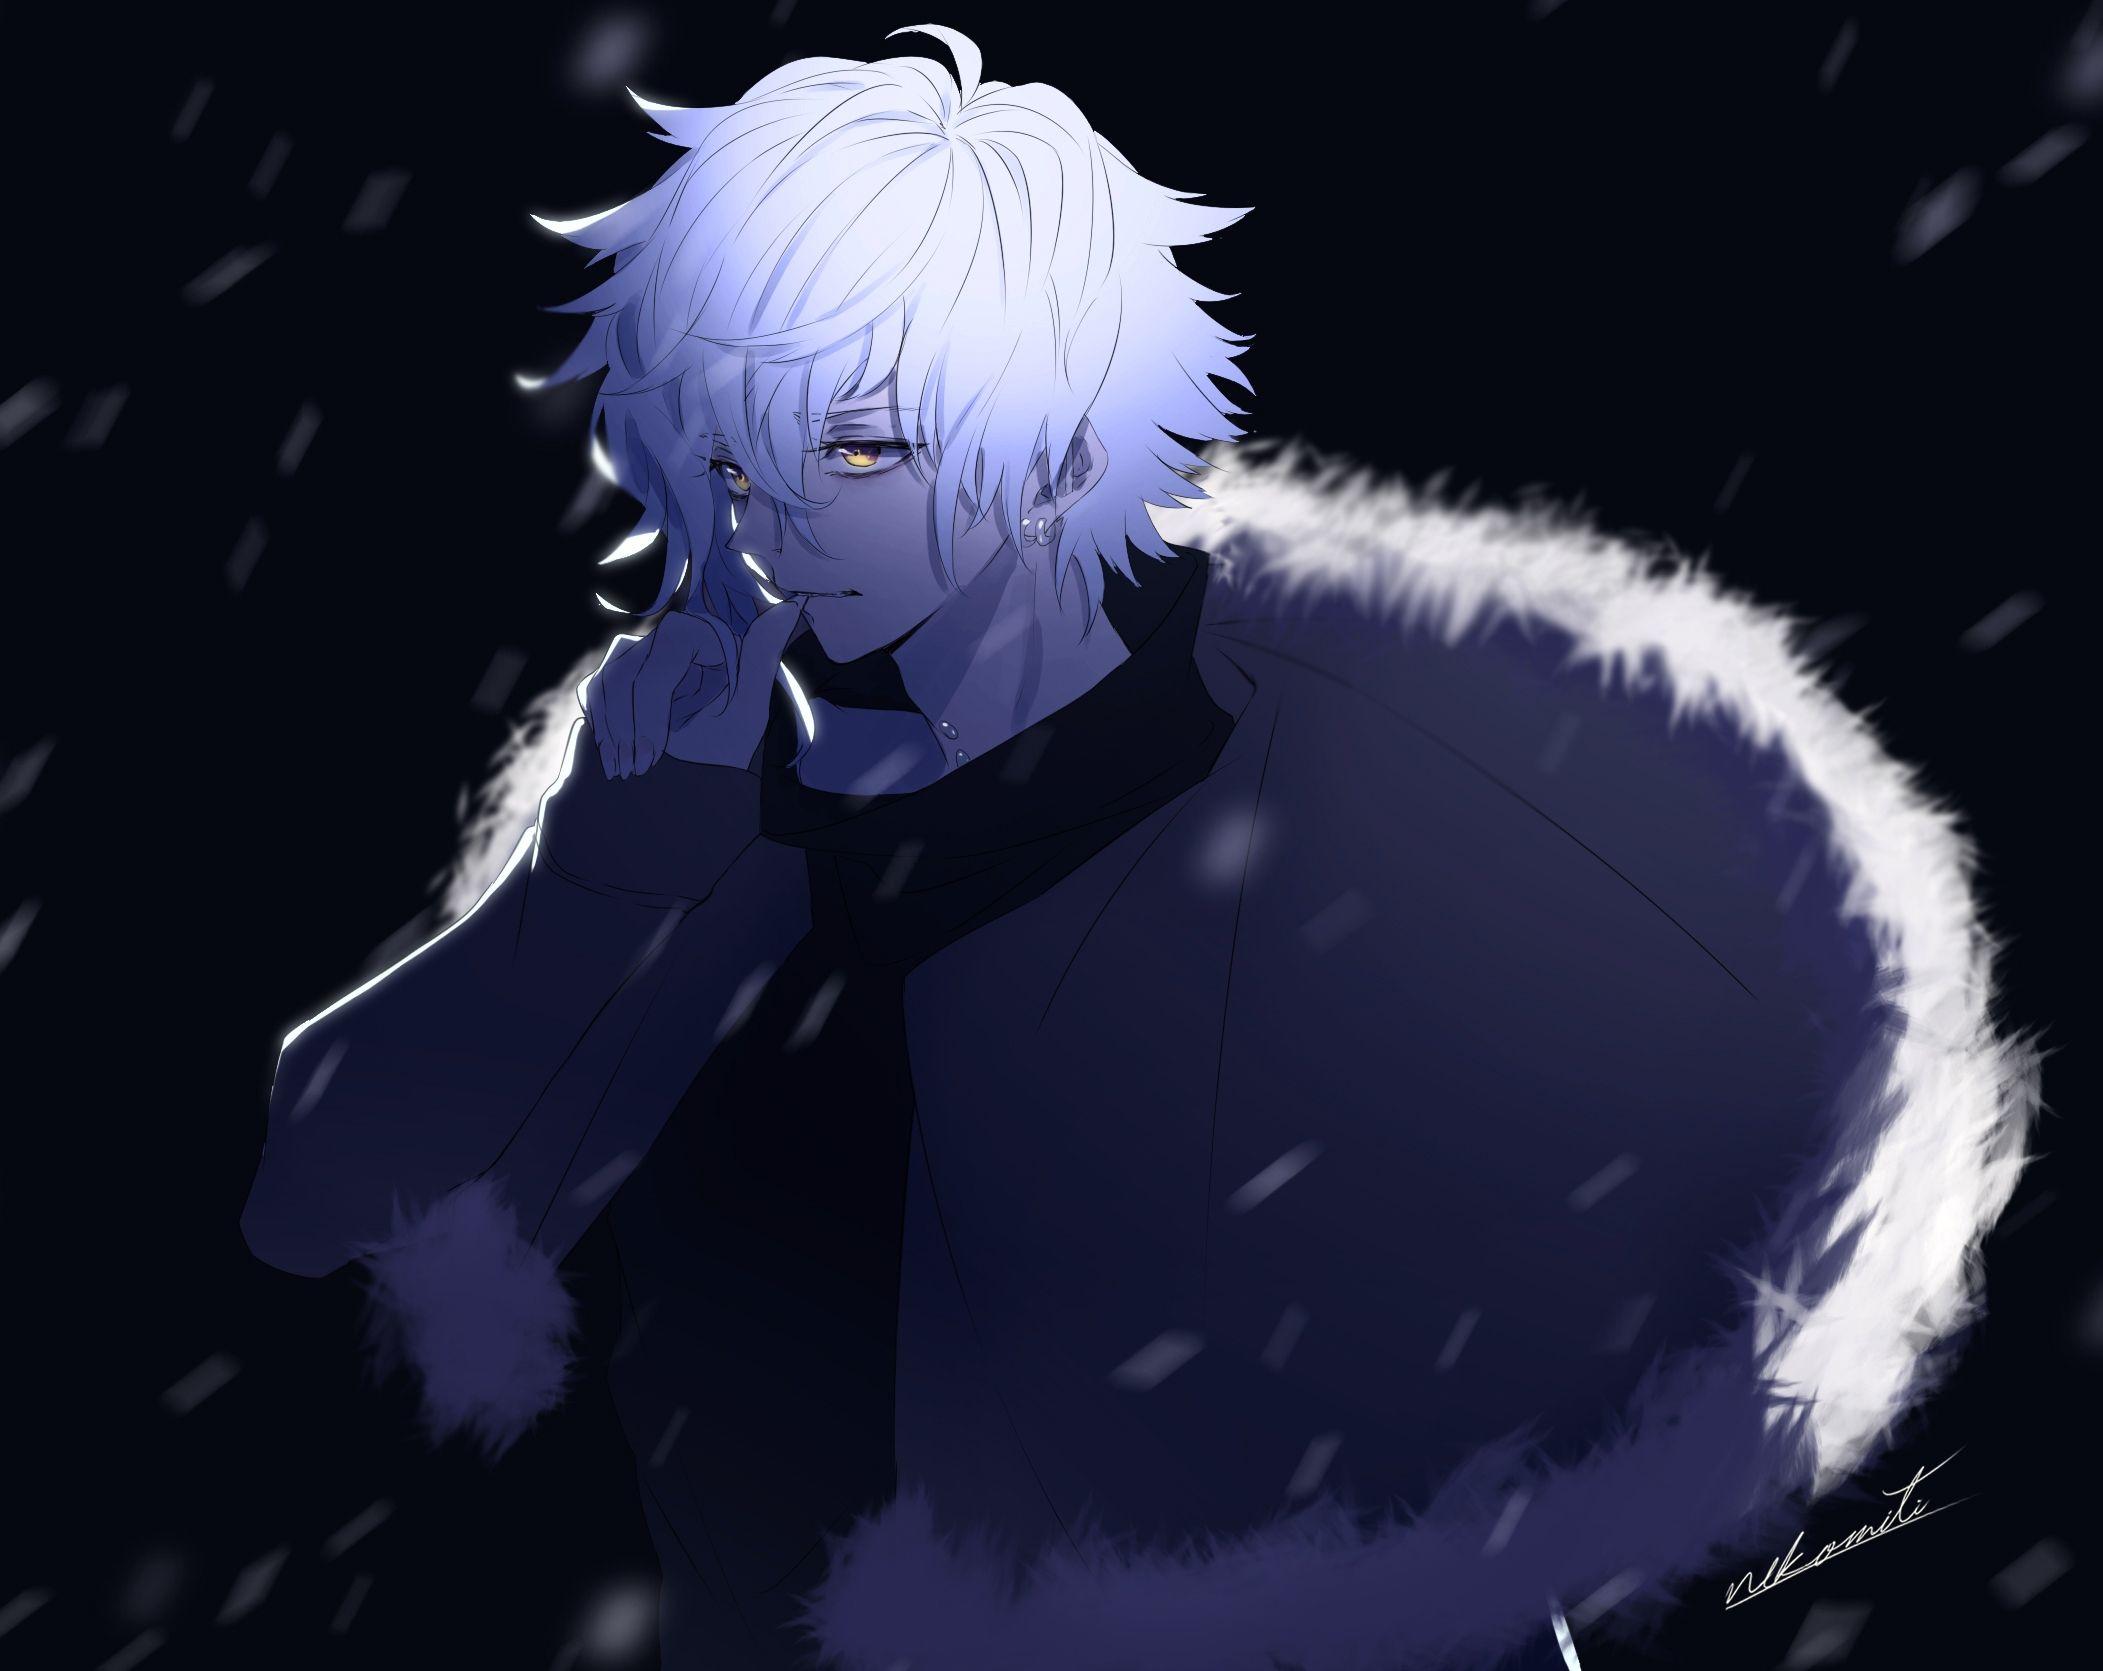 Kadoc Zemlupus Fate Grand Order White Hair Anime Anime Guys White Hair Anime Guy